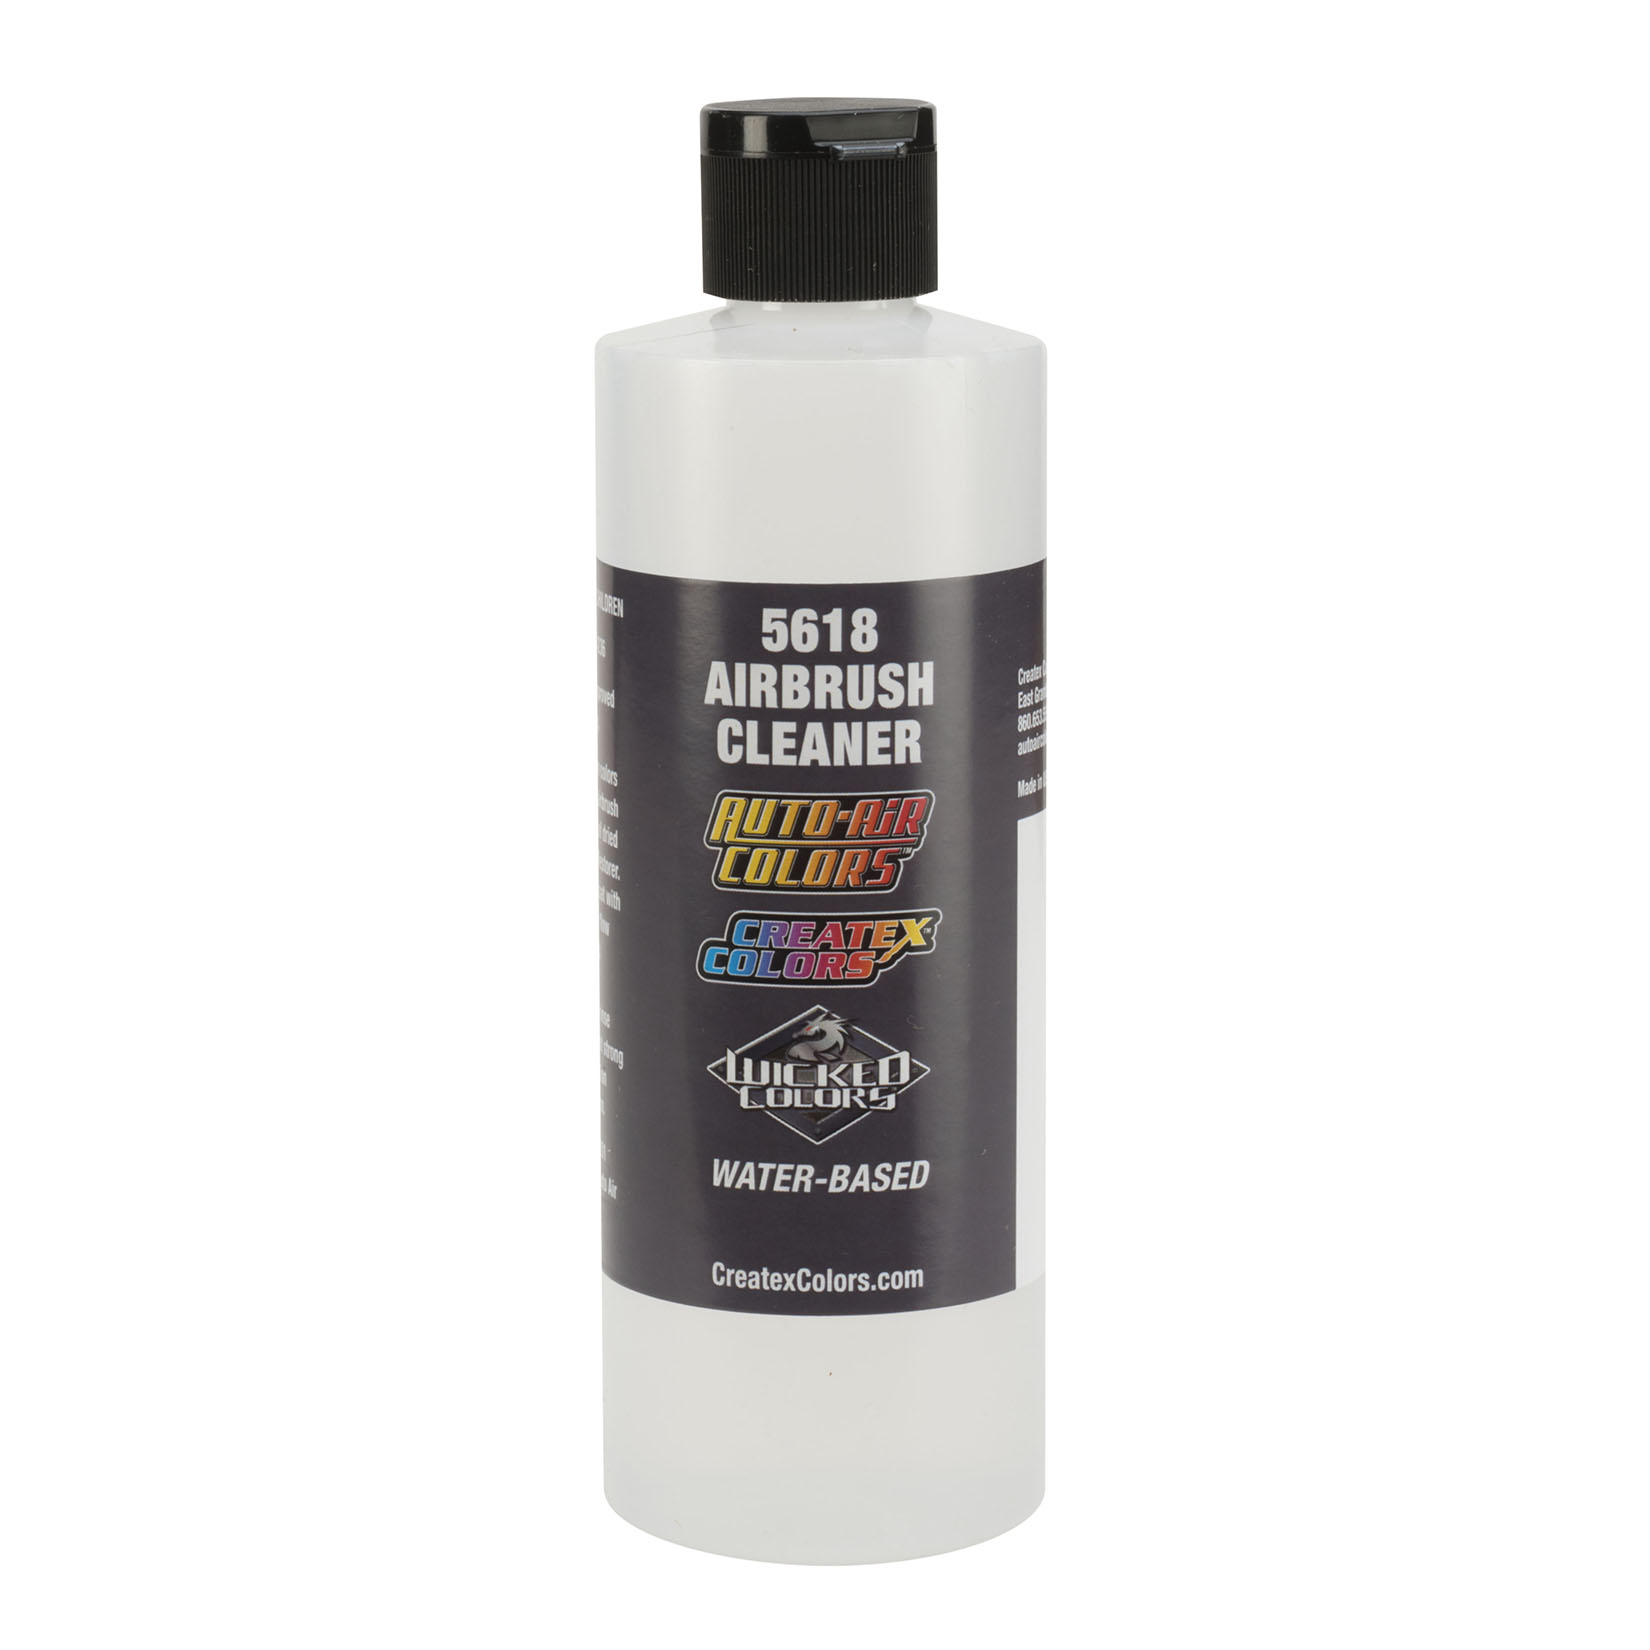 Airbrush Reiniger 480ml Createx 5618 Airbrush Colors Cleaner